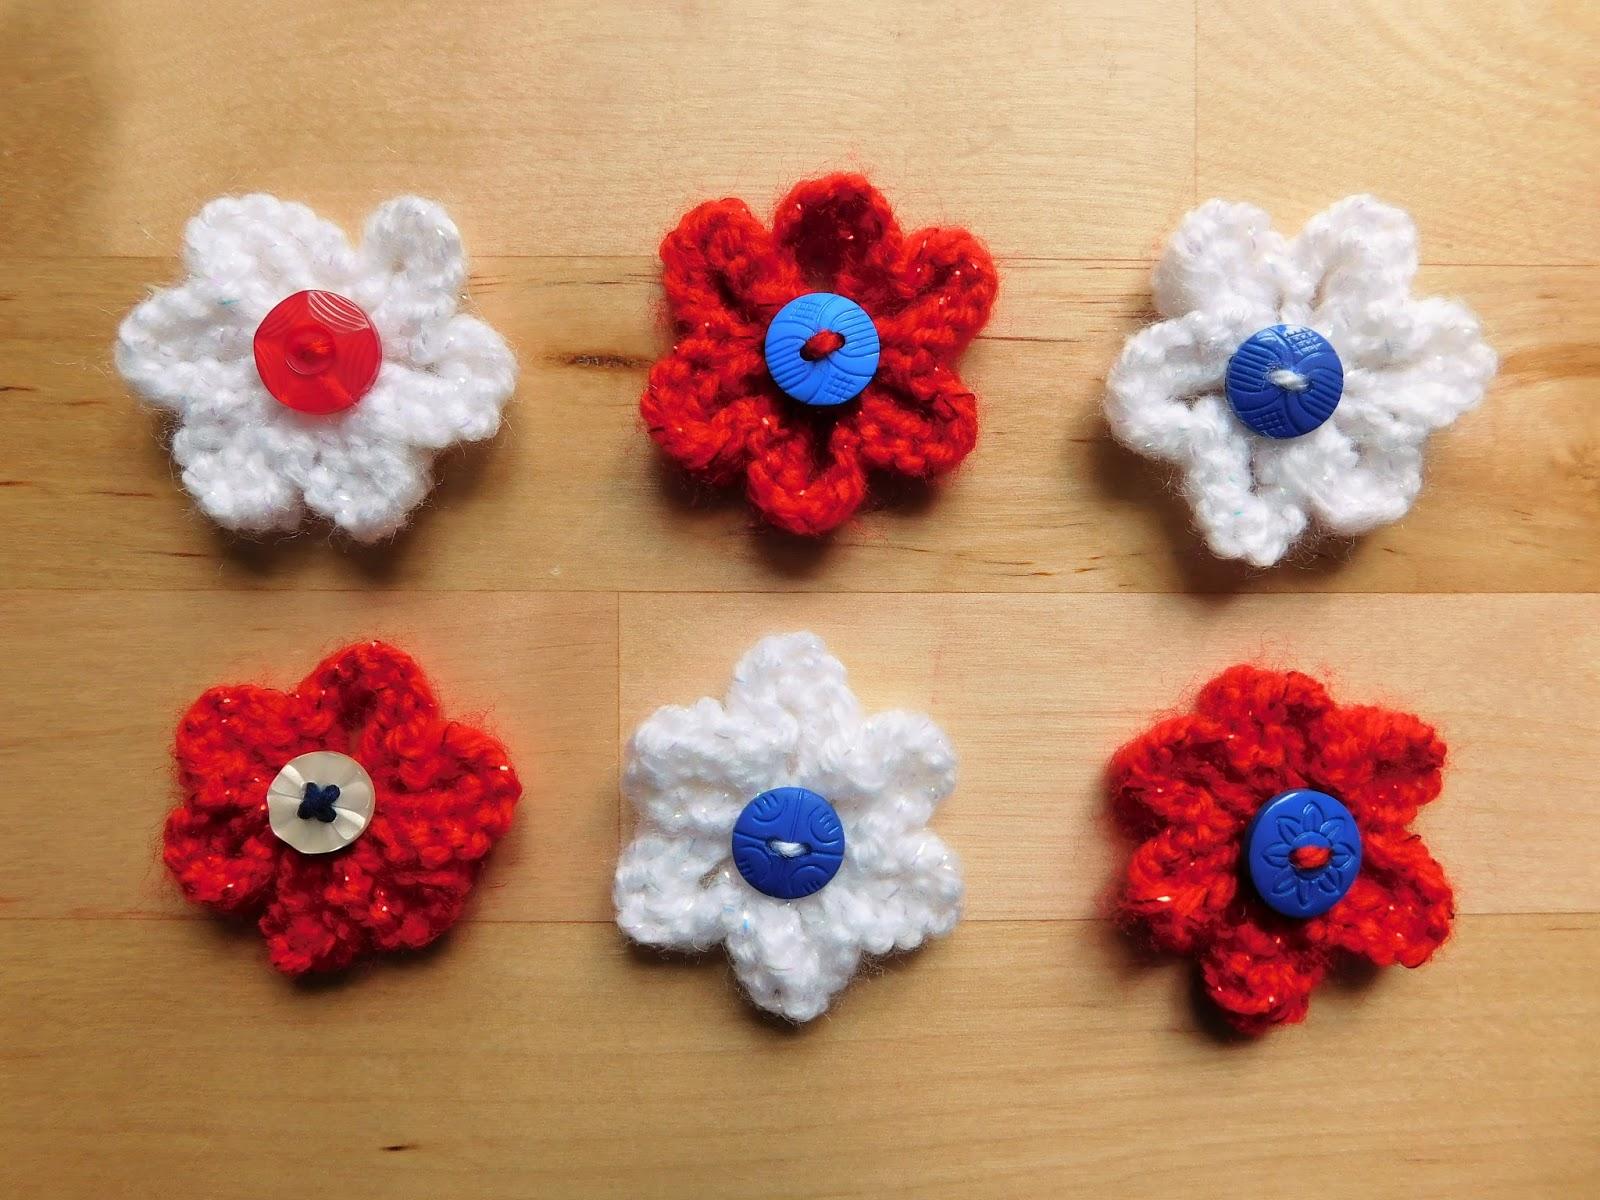 Mariannas lazy daisy days knitted summer flowers knitted summer flowers izmirmasajfo